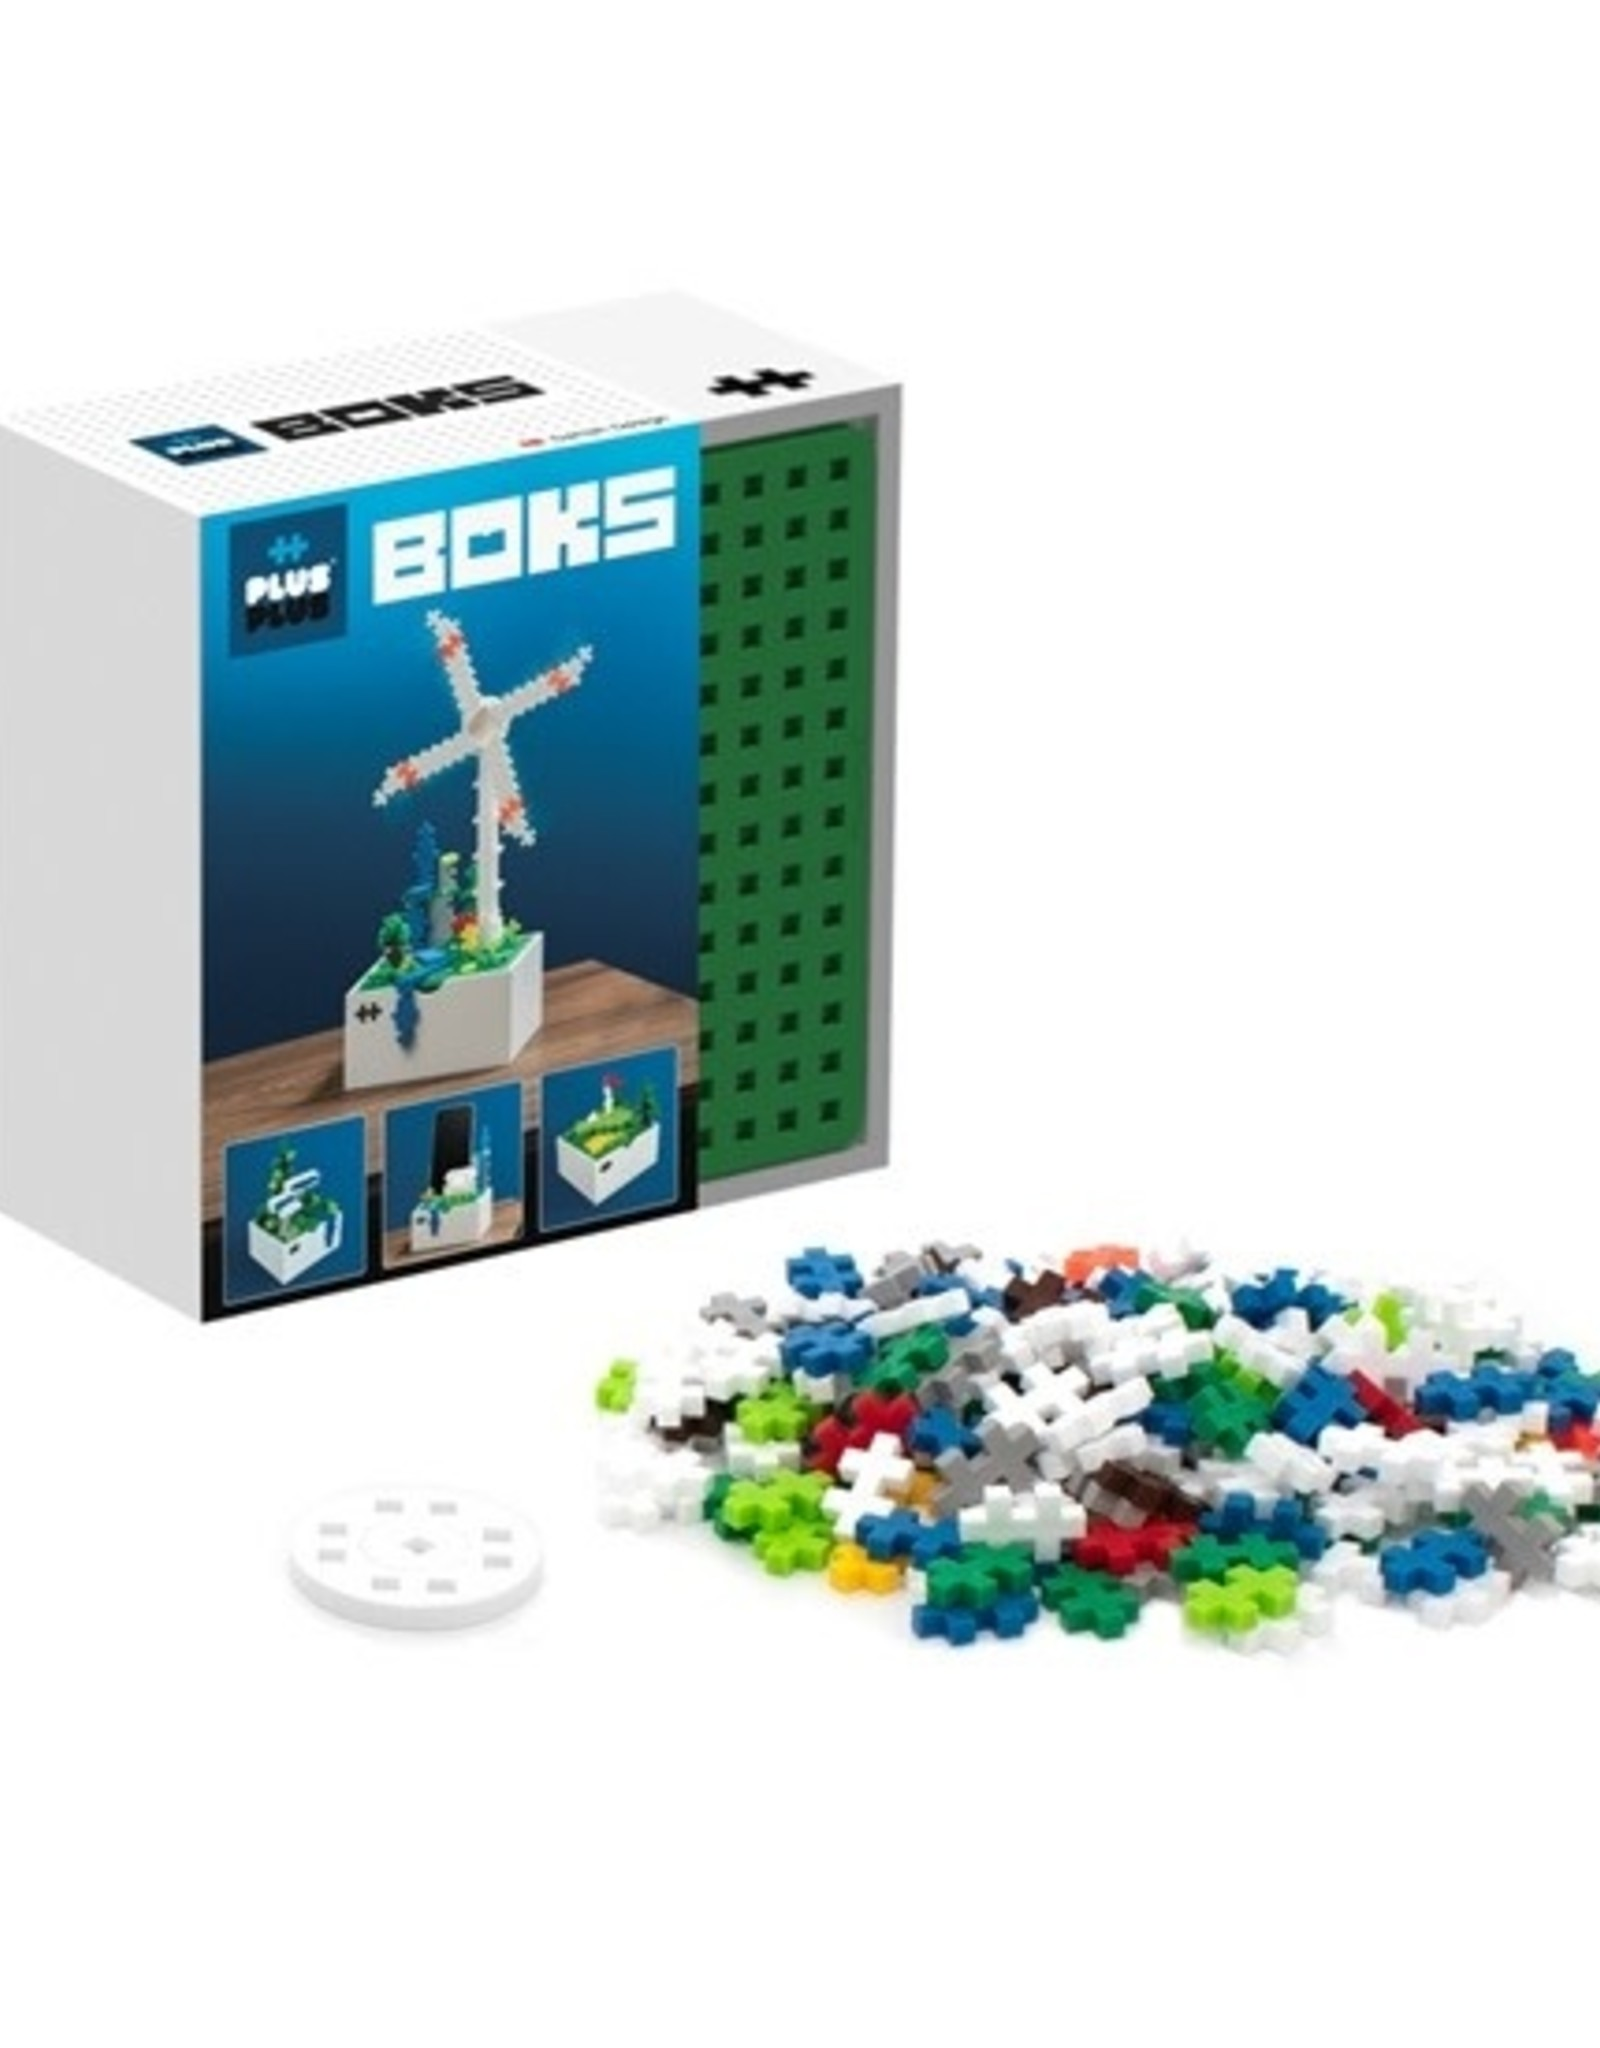 Plus-Plus BOKS Windmill